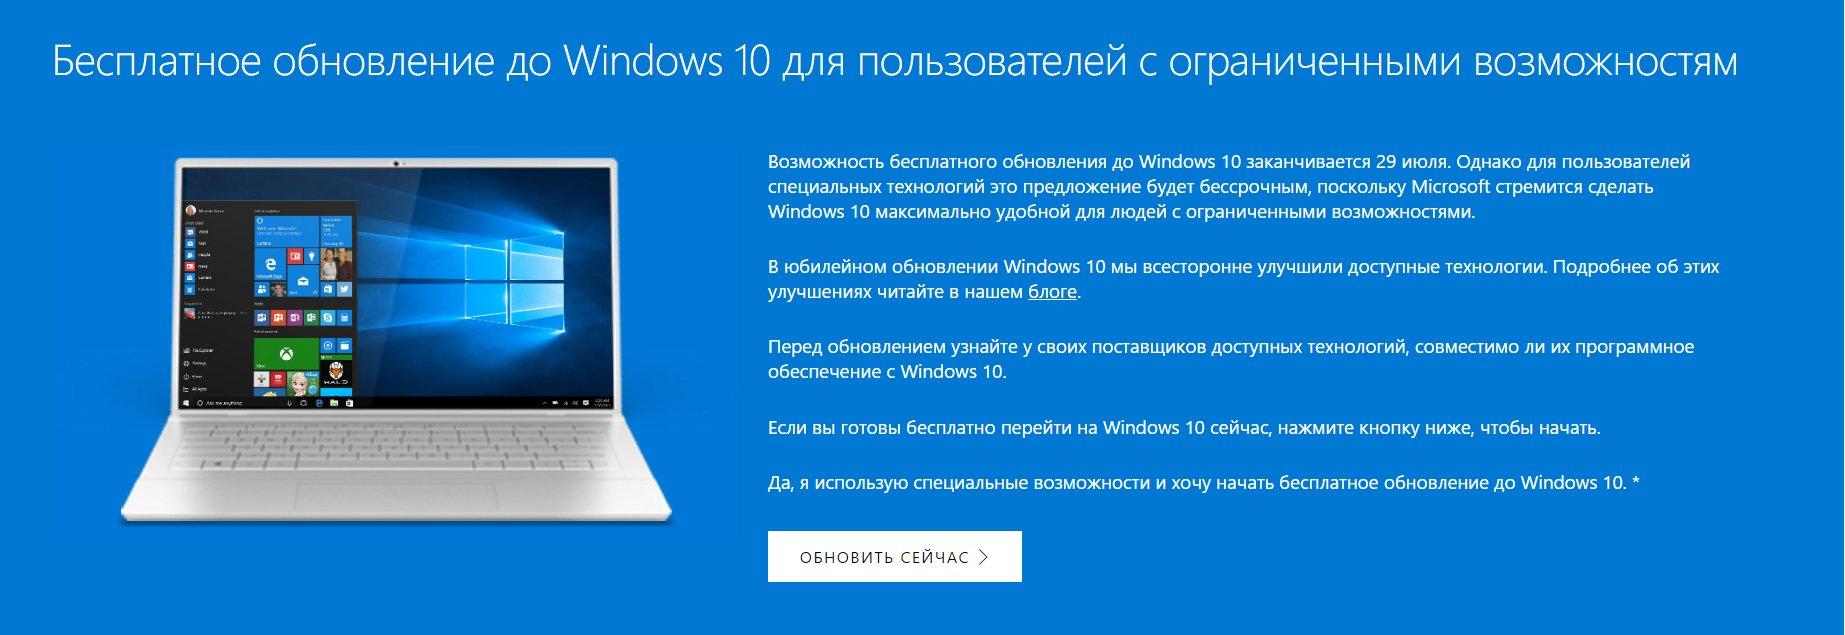 сколько занимает windows 10 home